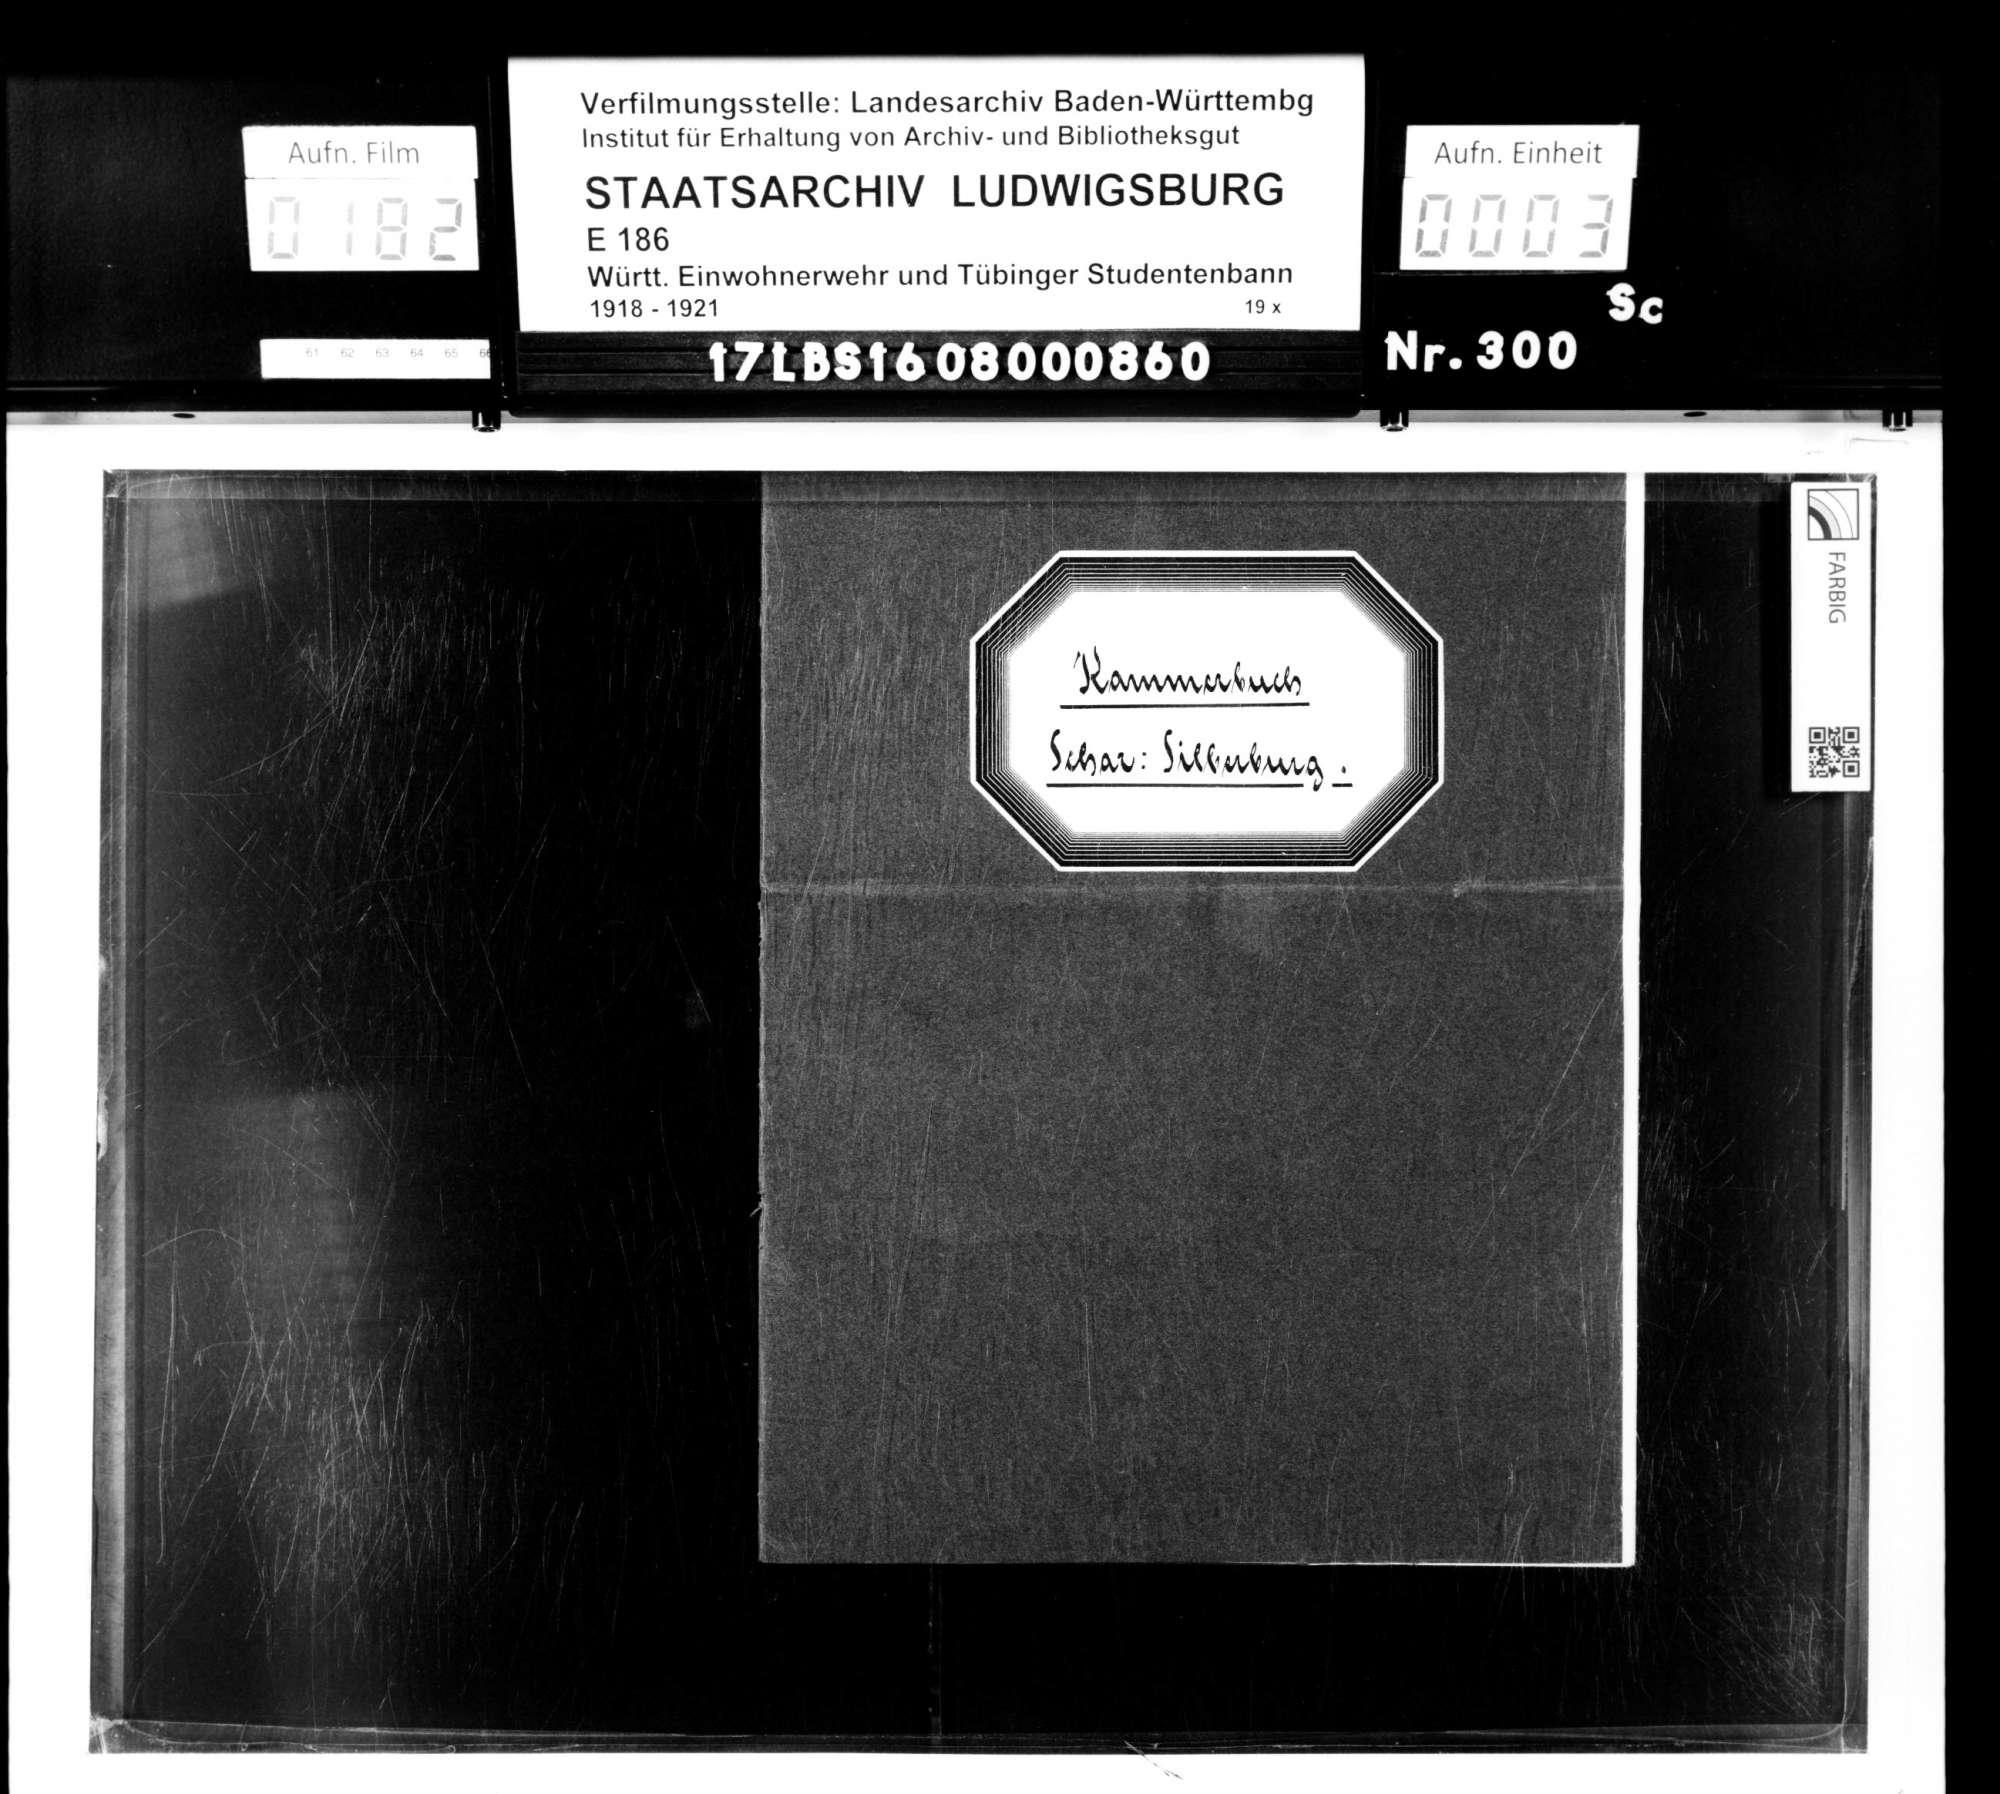 Bann 8/Schar Silberburg: Kammerbuch, Bild 1